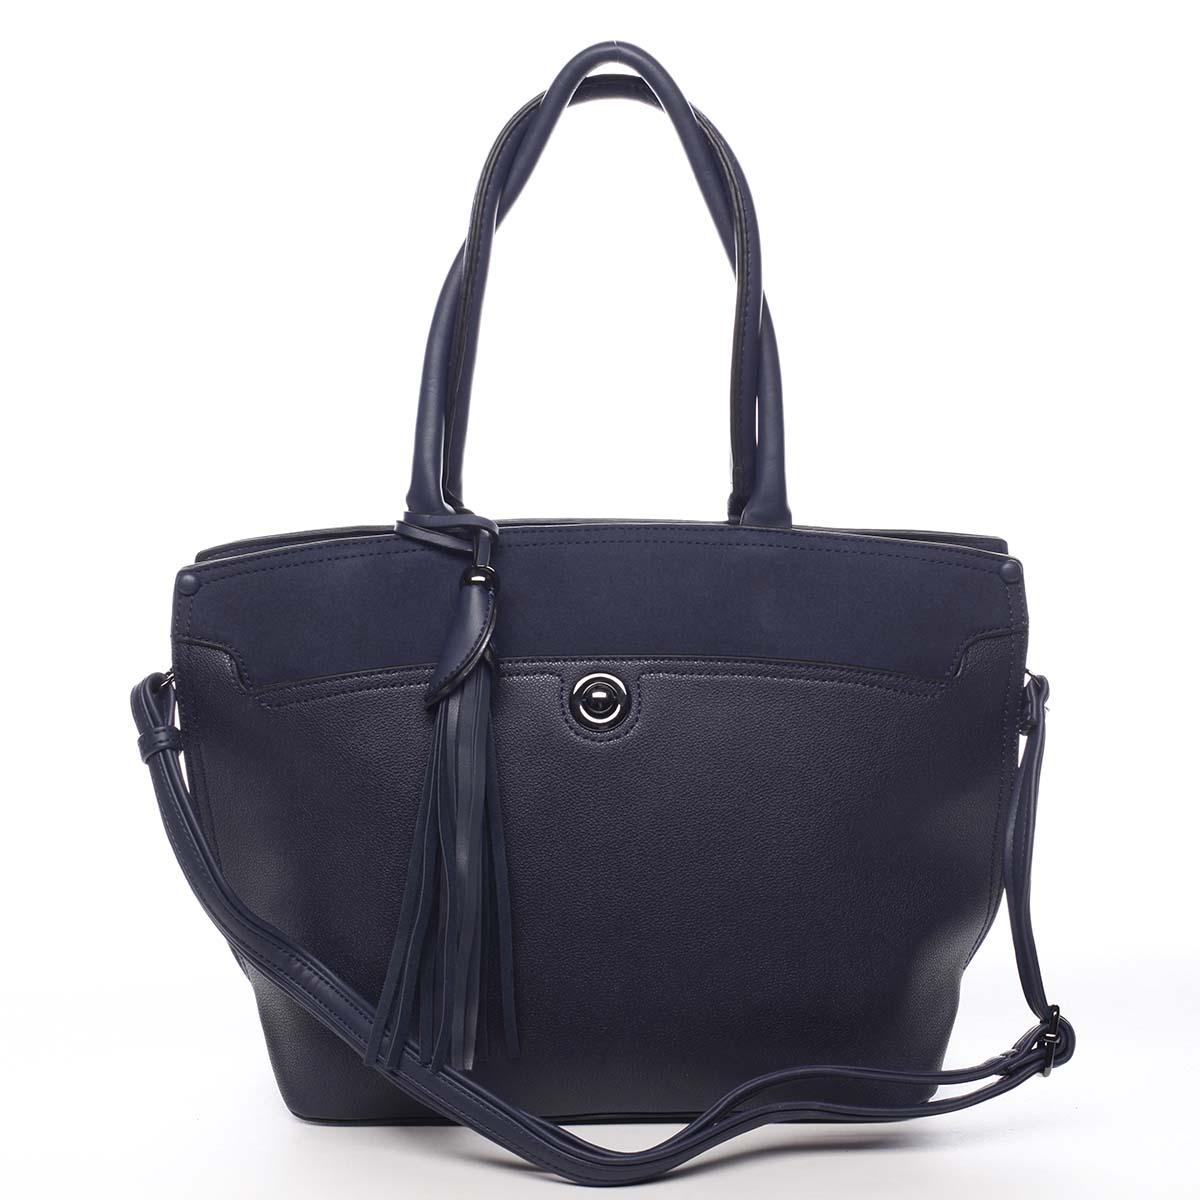 Dámska kabelka cez rameno tmavo modrá - Maria C Loray modrá